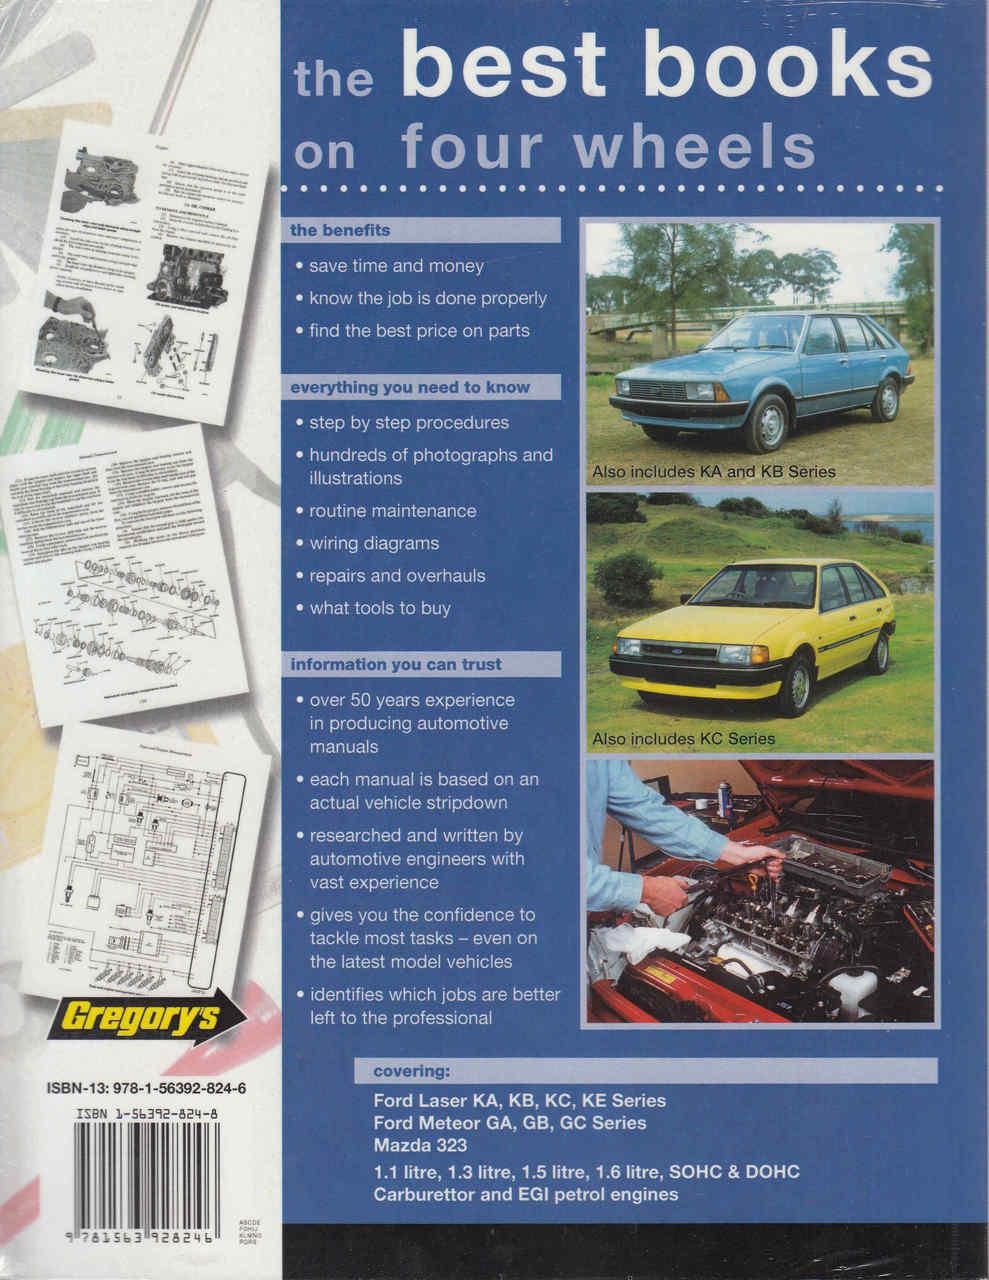 ... Ford Laser, Ford Meteor and Mazda 323 KA to KE / GA to GC Series